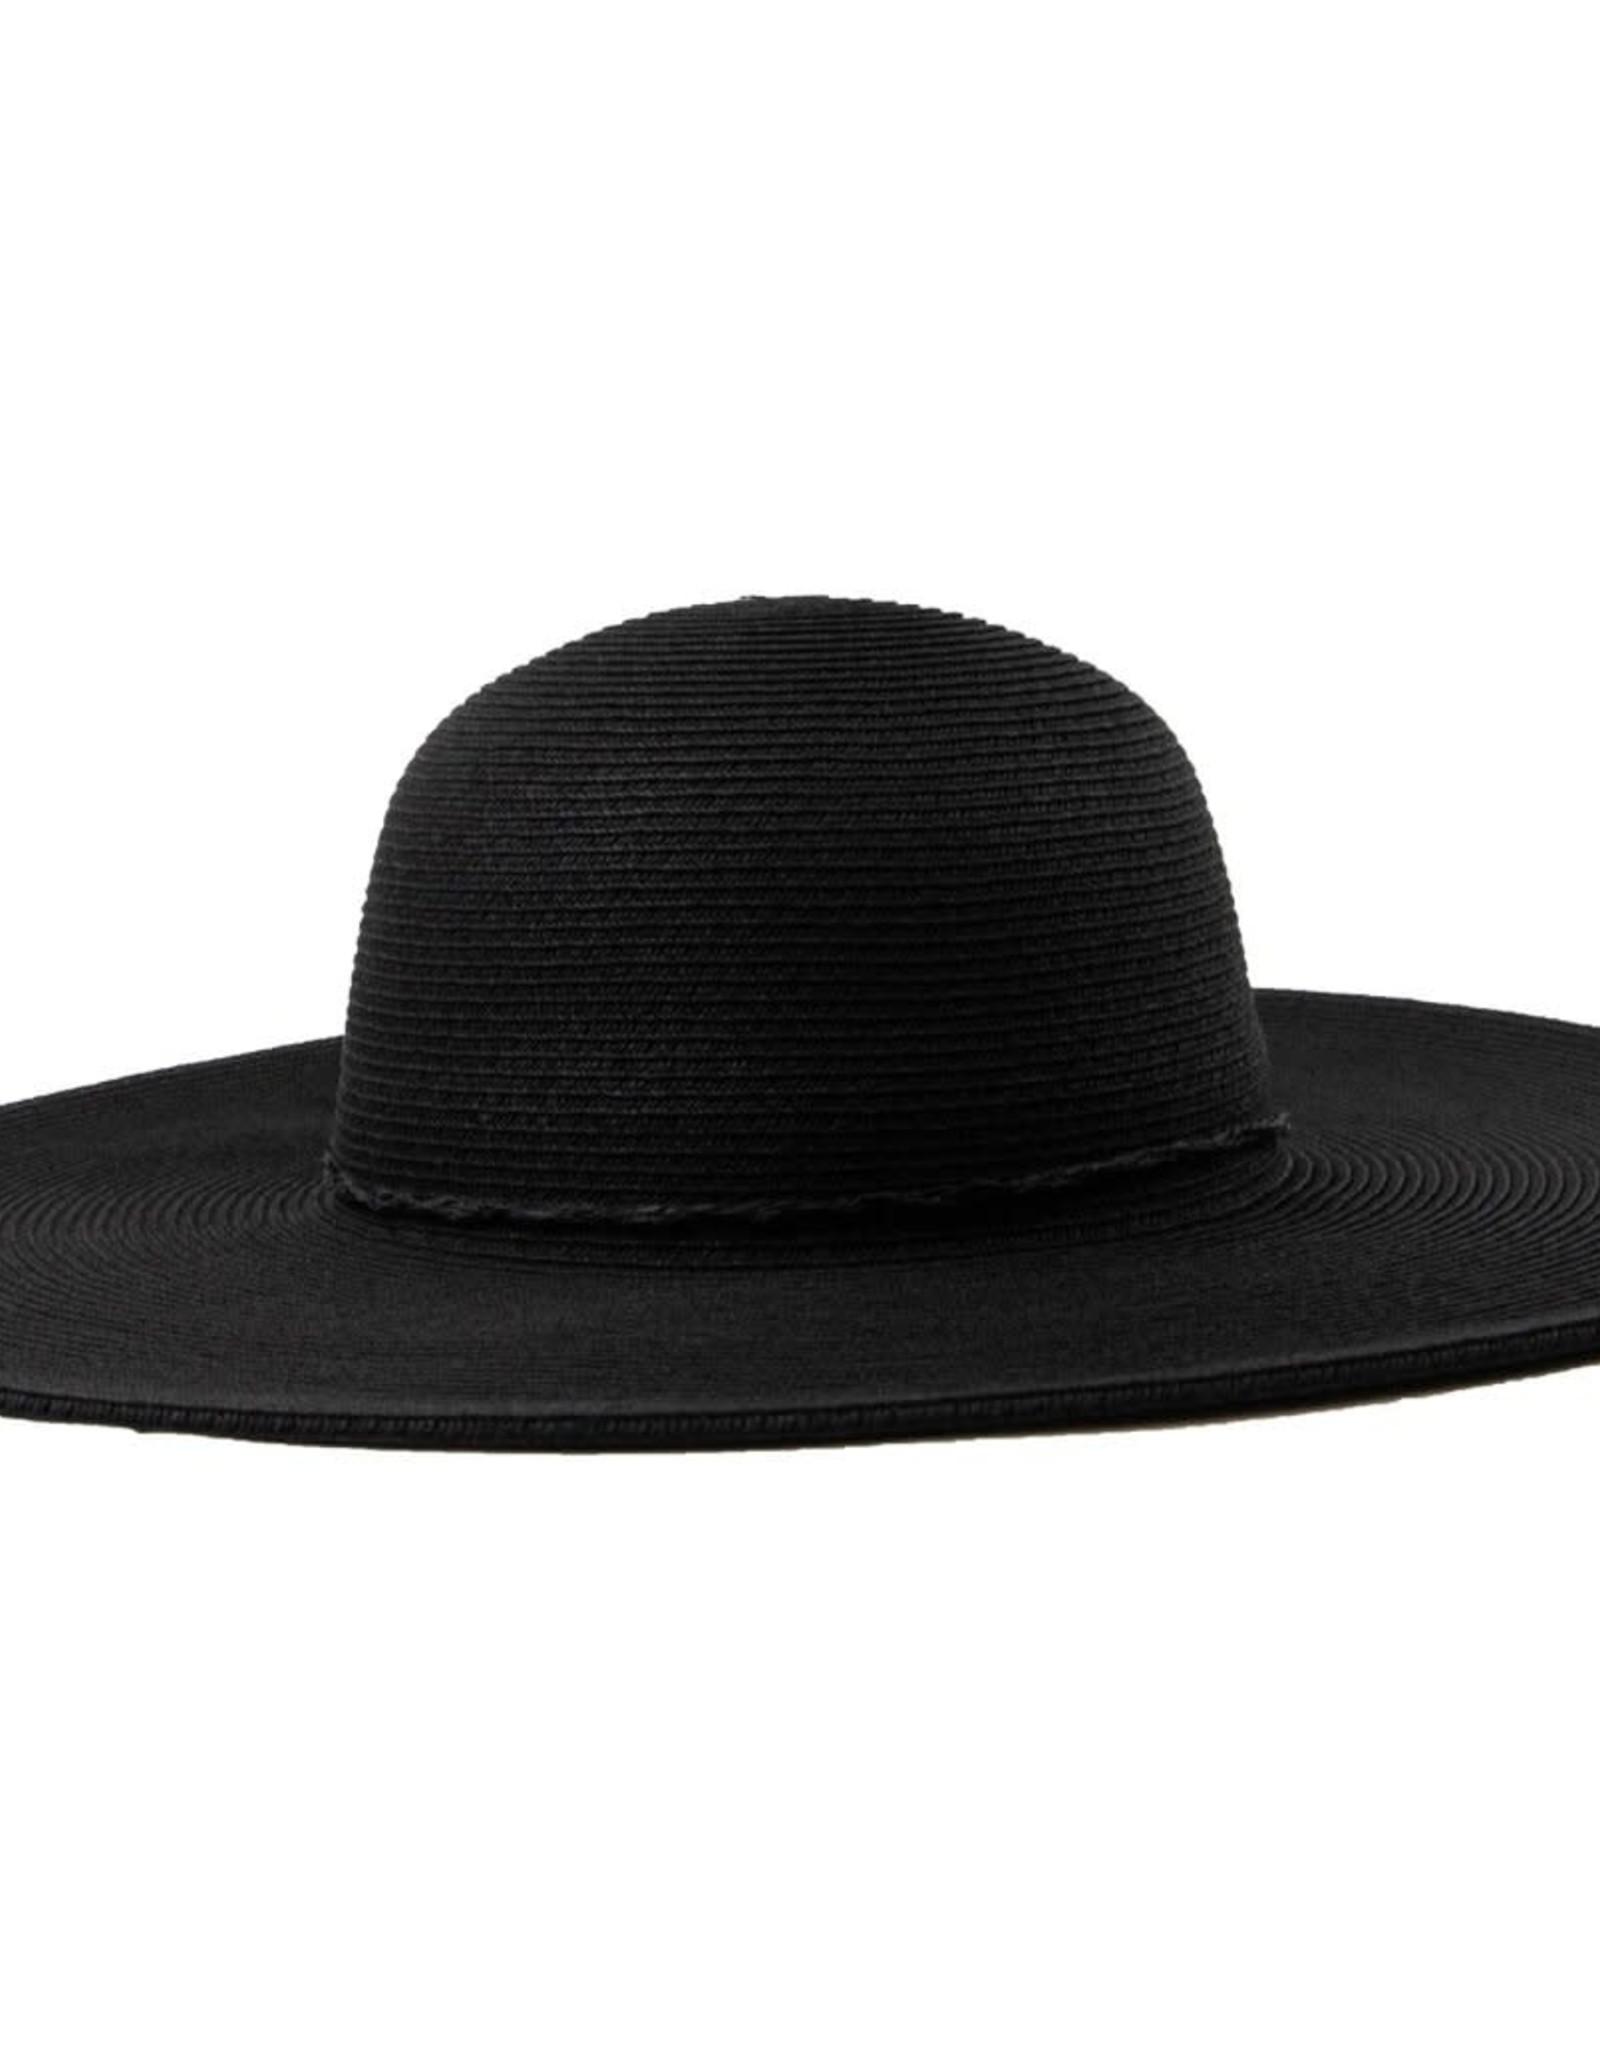 SAN DIEGO HAT Water Repellent Floppy Hat - Black